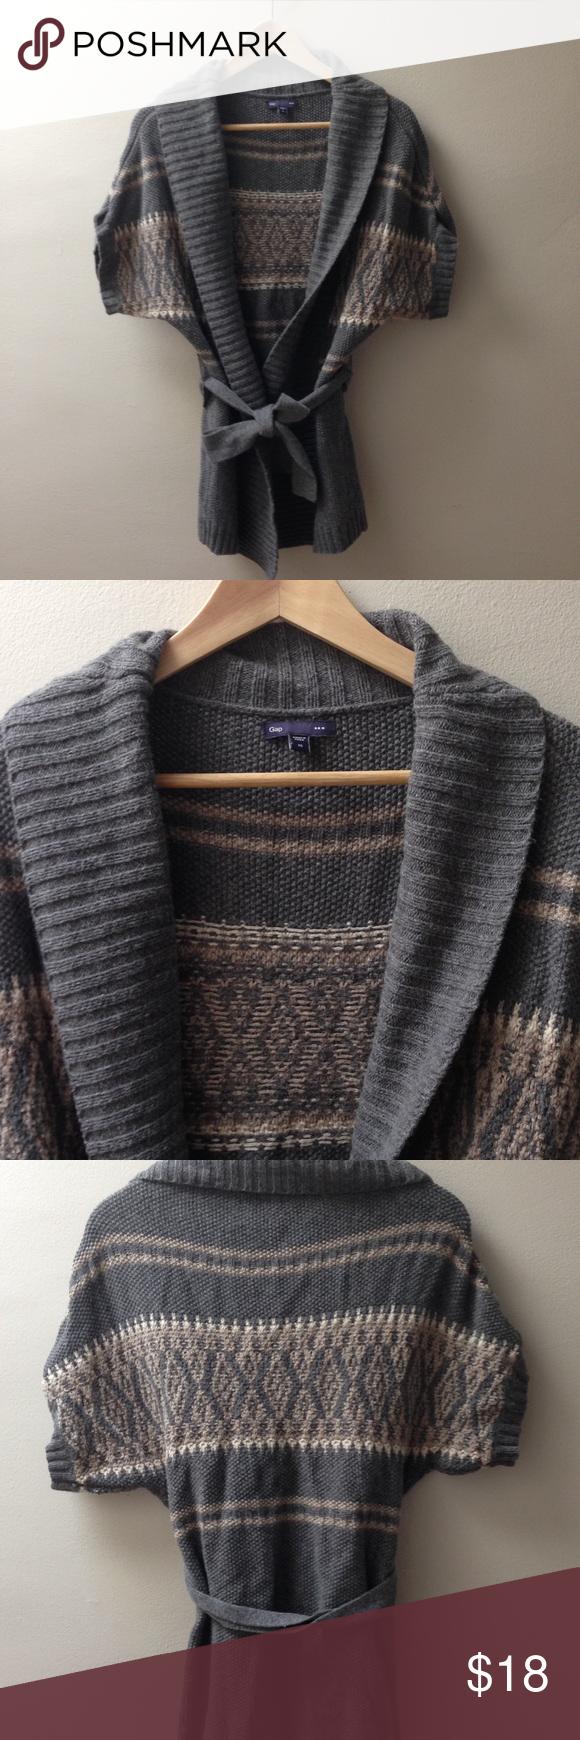 Gap Sweater Gap Factory short sleeve wrap sweater with tie belt ...